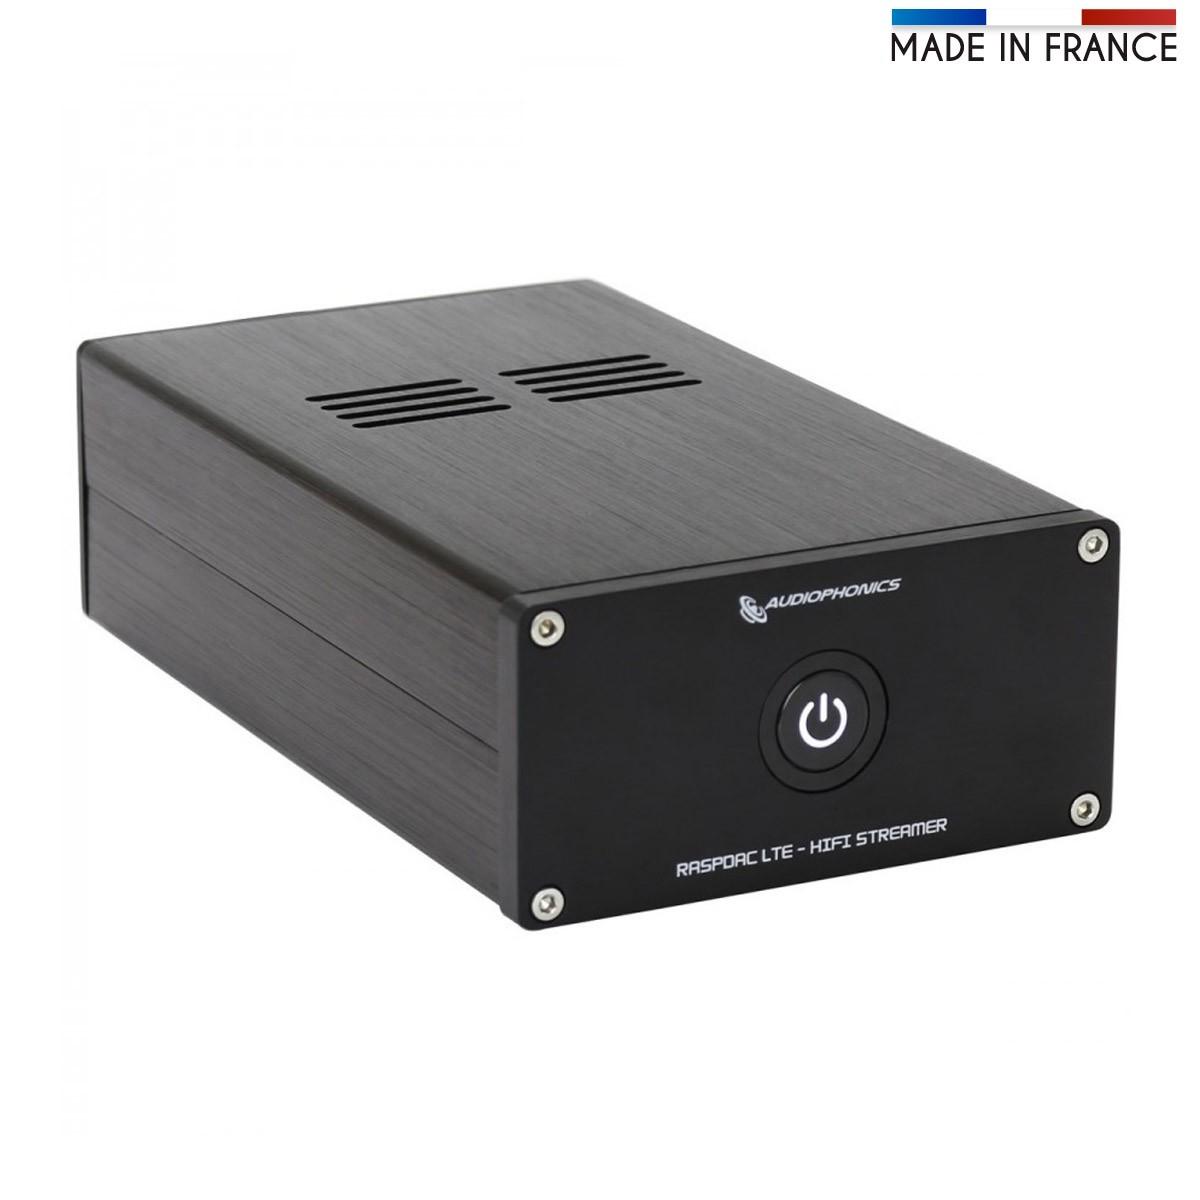 RASPDIGI LTE LVDS V2 Streamer I2S LVDS HDMI Allo Kali Reclocker Audio-GD Compatible